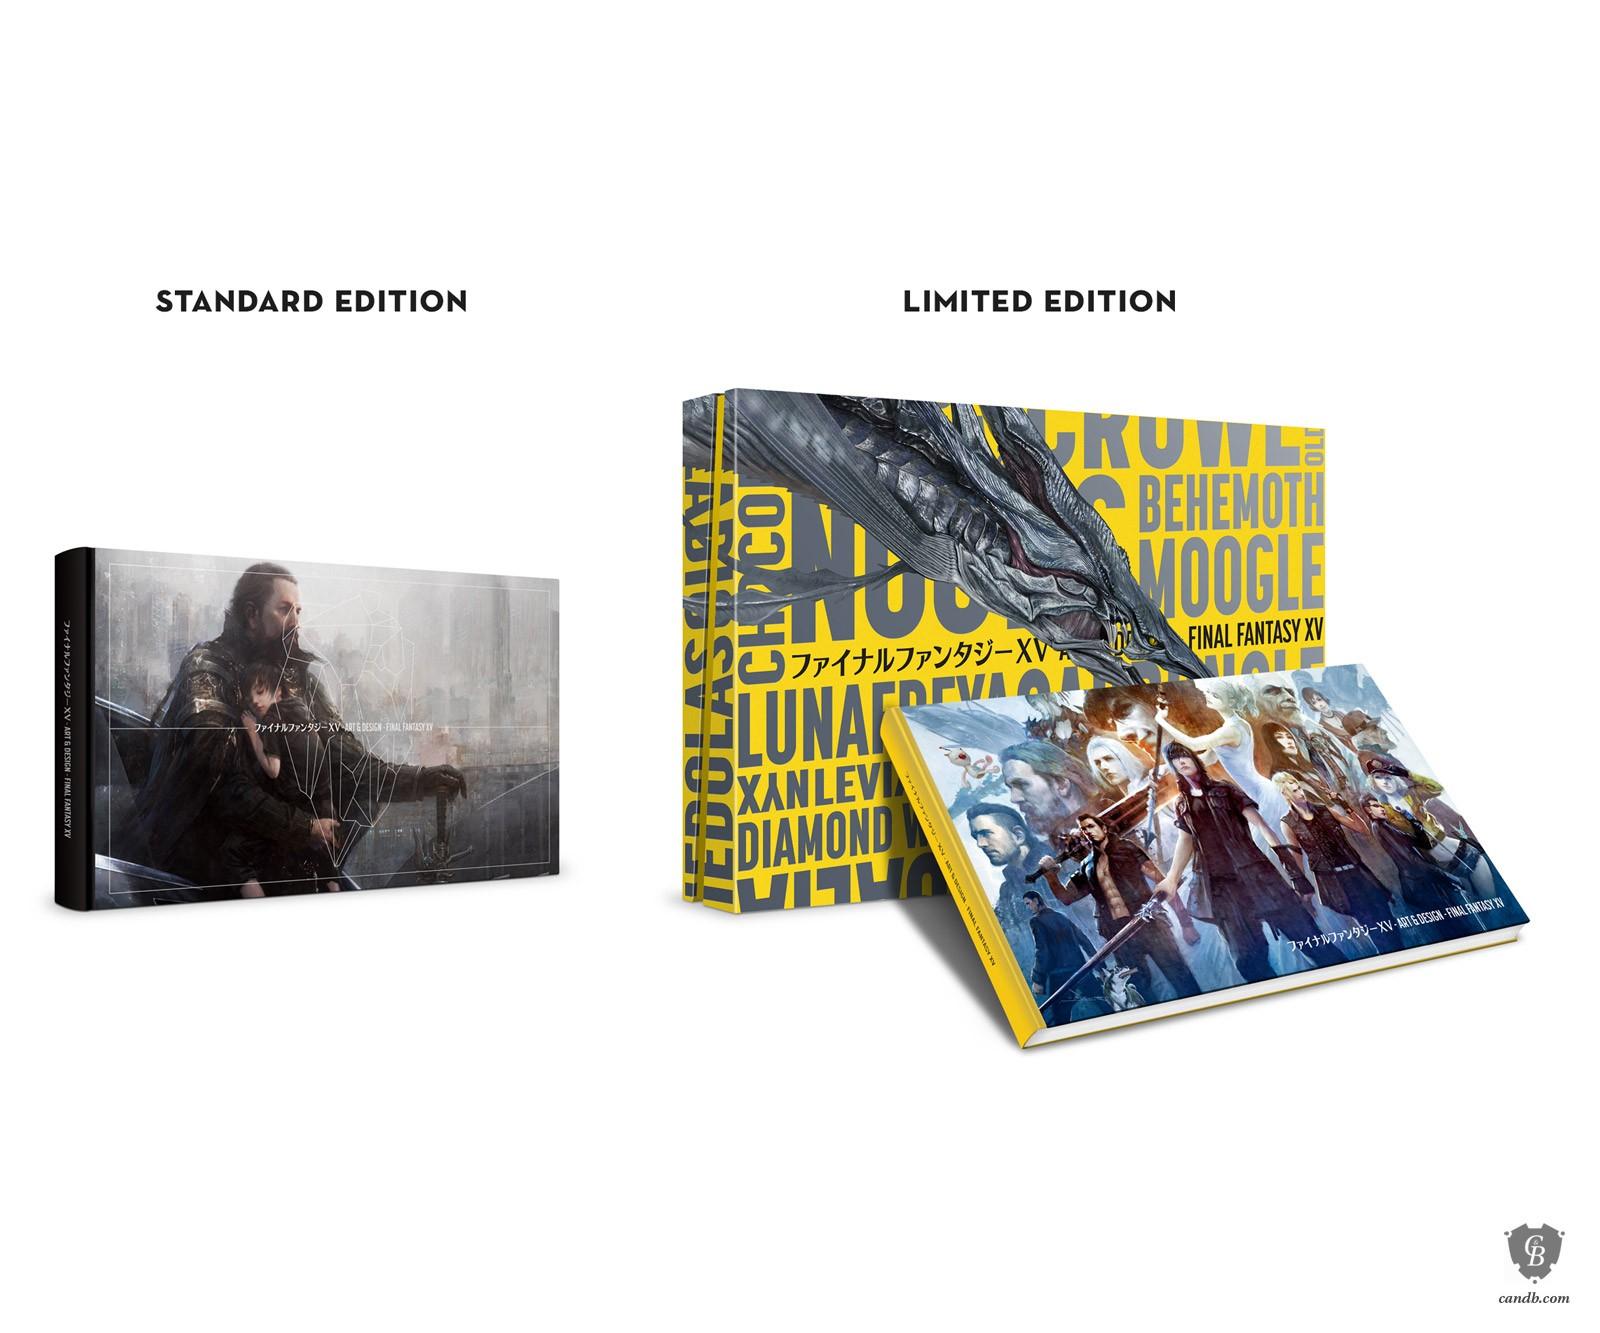 Artwork The Art and Design of FINAL FANTASY XV Square Enix